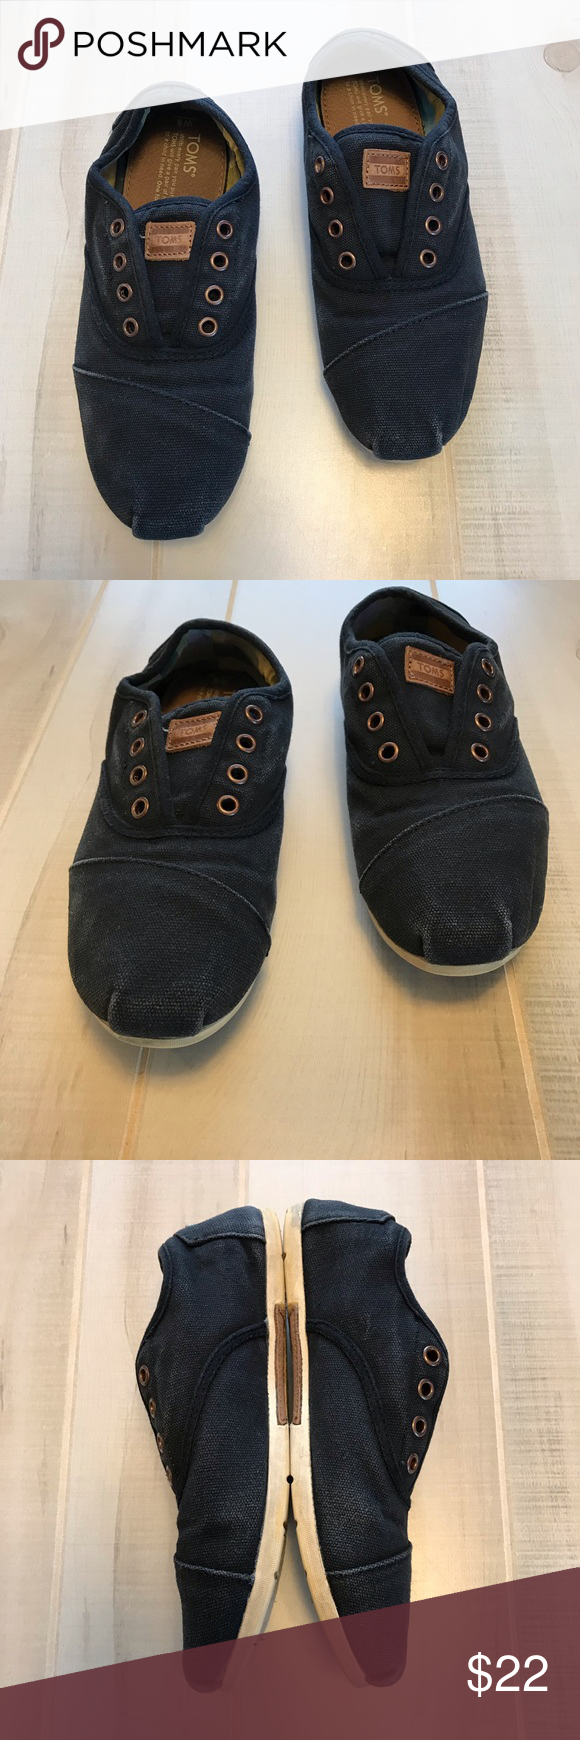 e2800b6857 TOMS Navy Canvas Slip On Sneaker Shoe Laceless 8 Toms slip on sneakers.  Navy canvas